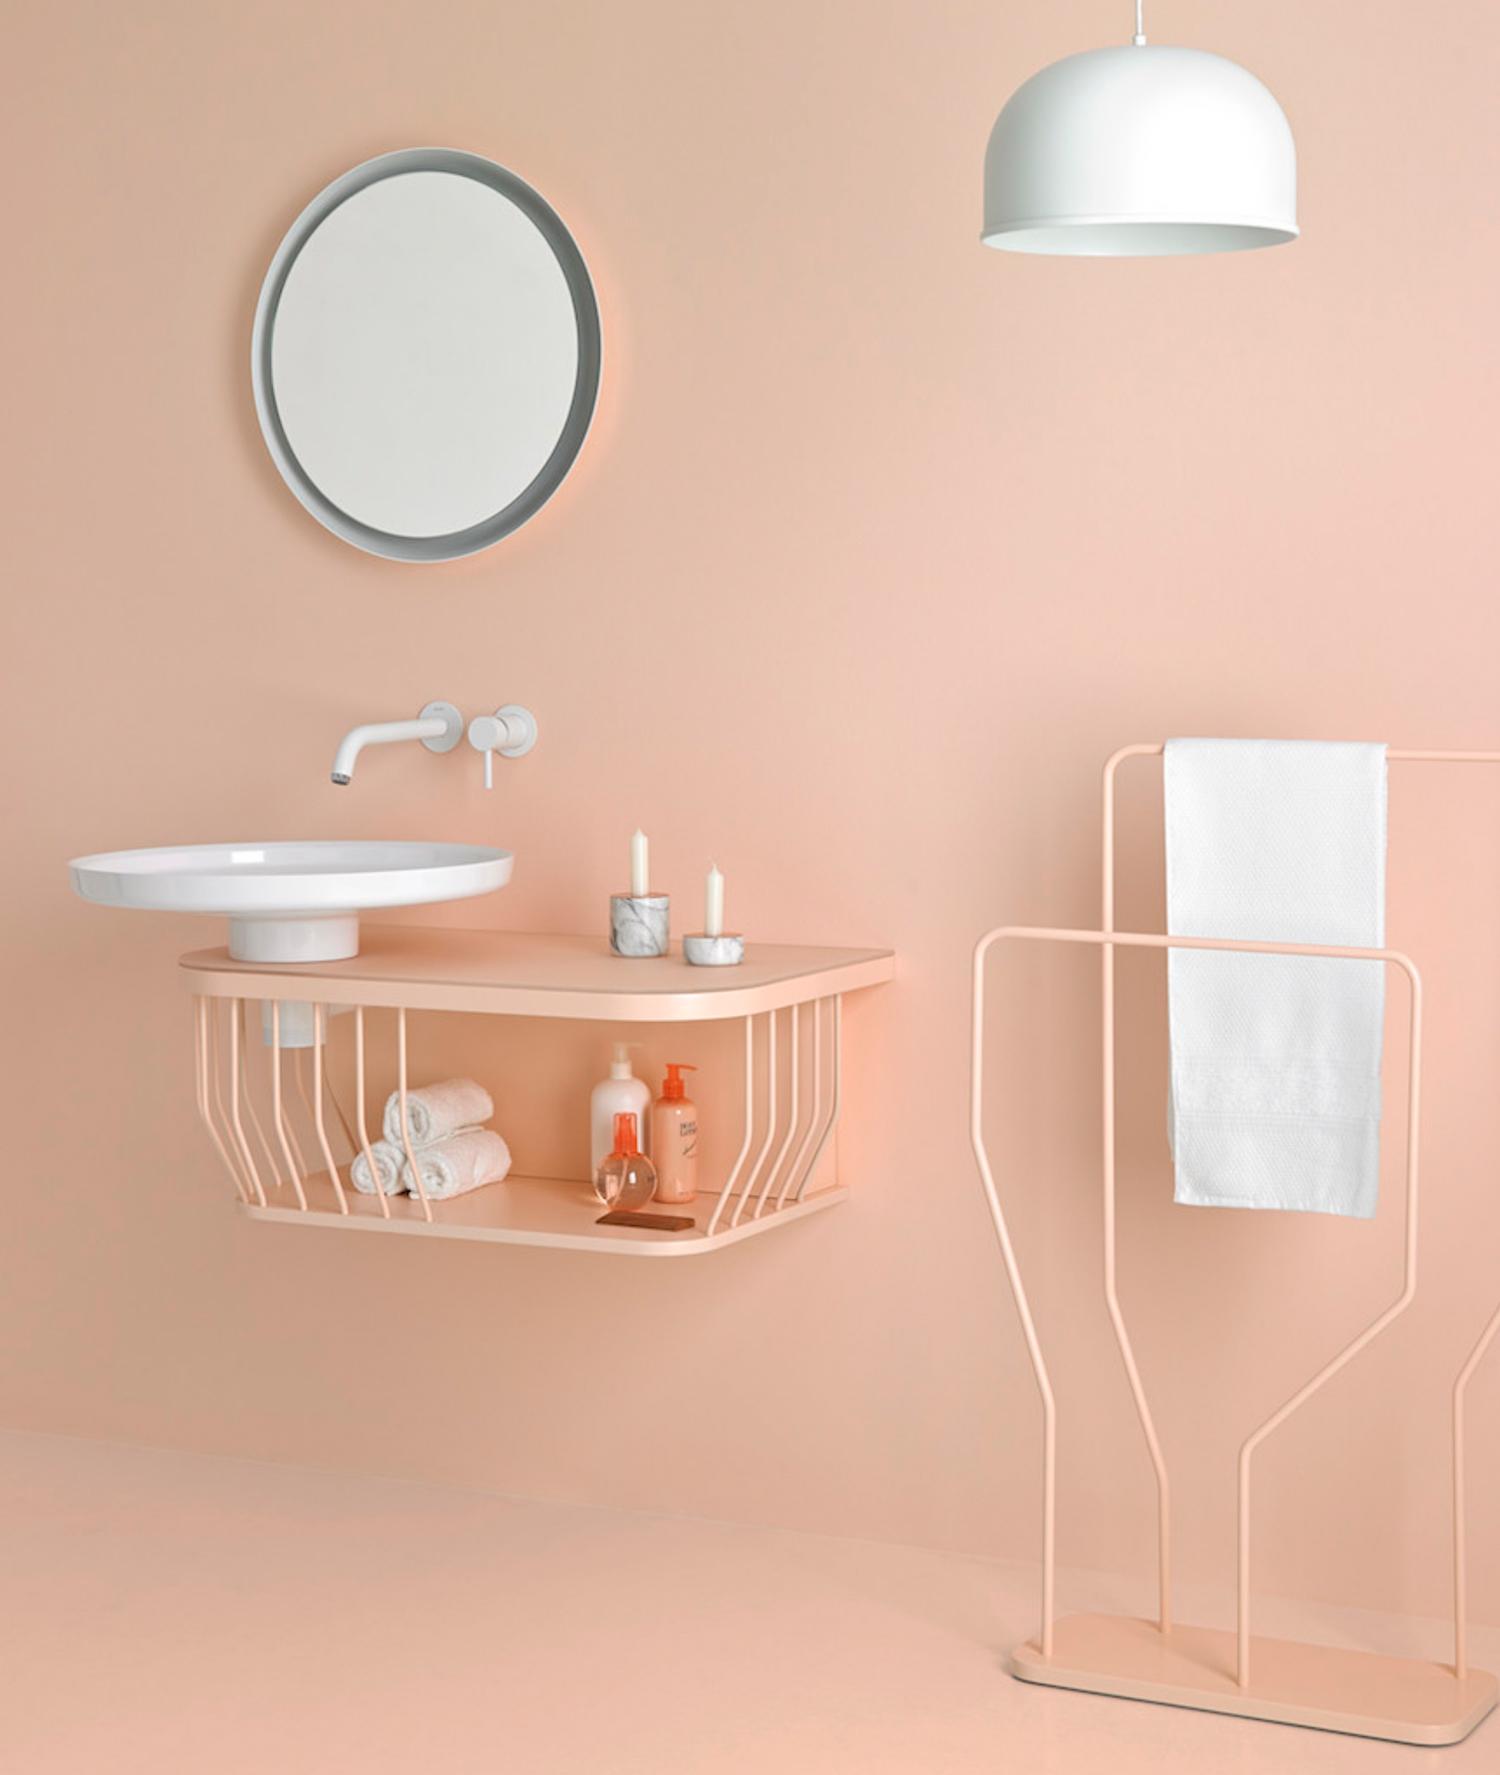 Bowl Countertop washbasin by INBANI designed by  Arik Levy